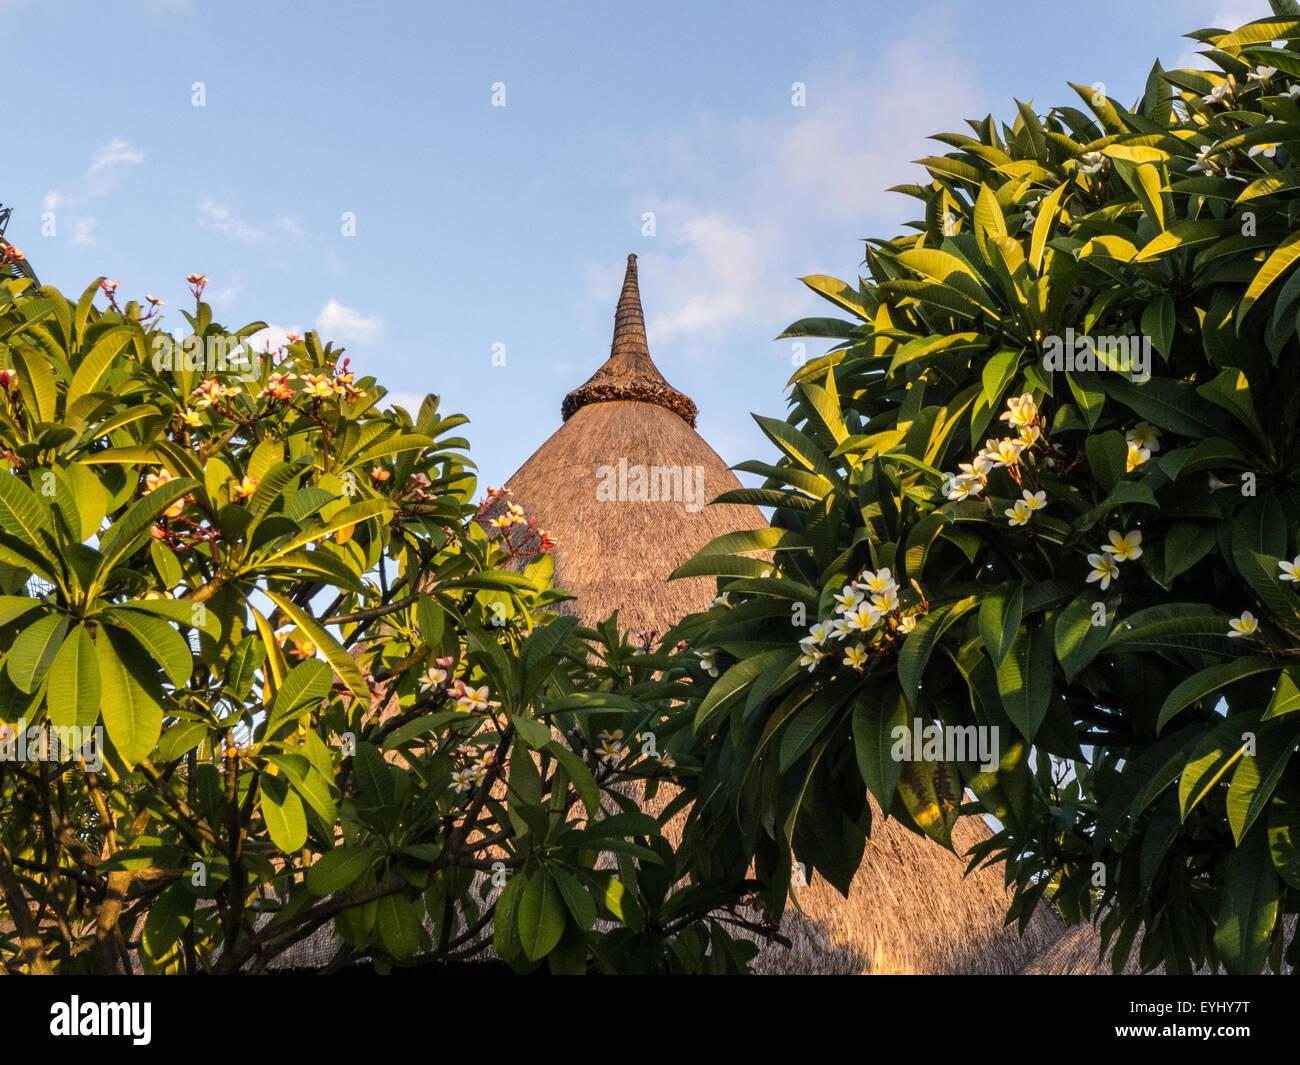 Flic en Flac, Mauritius. La Pirogue tourist resort. Traditional thatch roof and Frangipani trees. Stock Photo